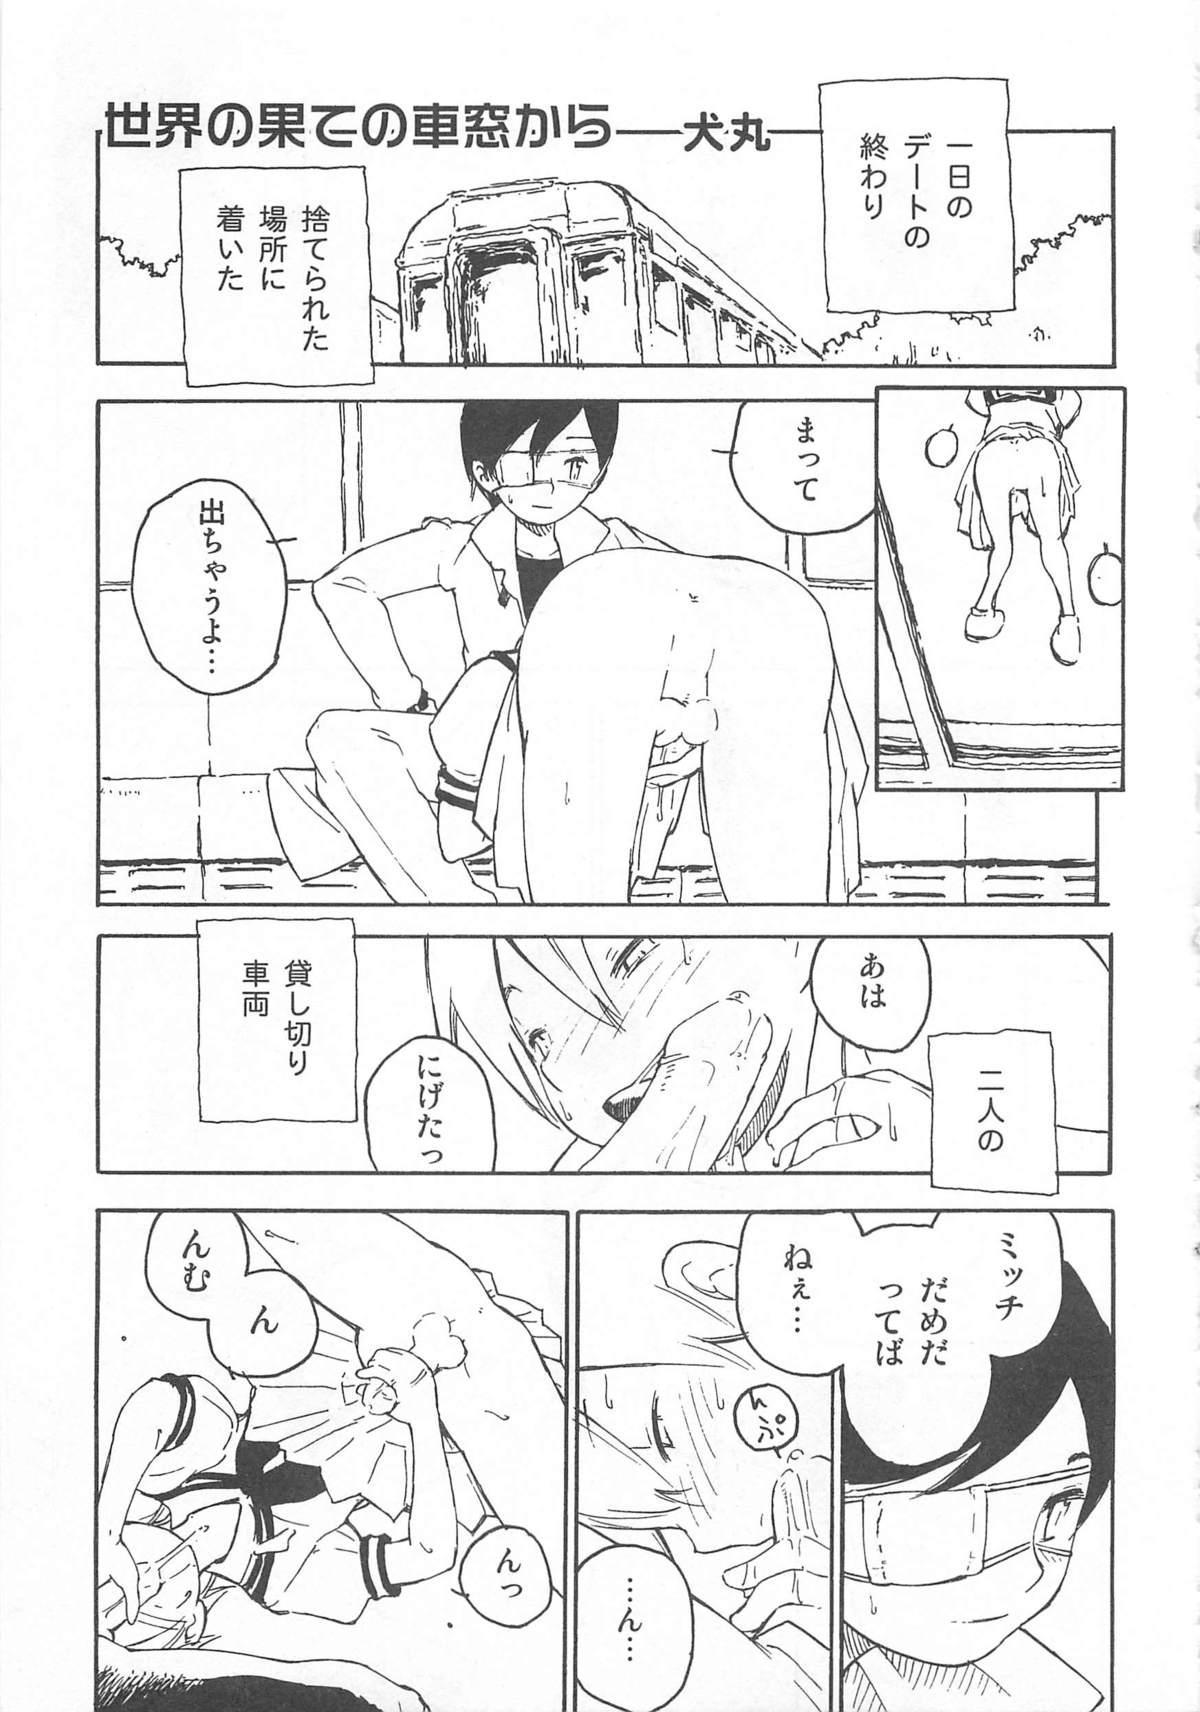 Otokonoko HEAVEN Vol. 02 Dokidoki Chikan Taiken 23